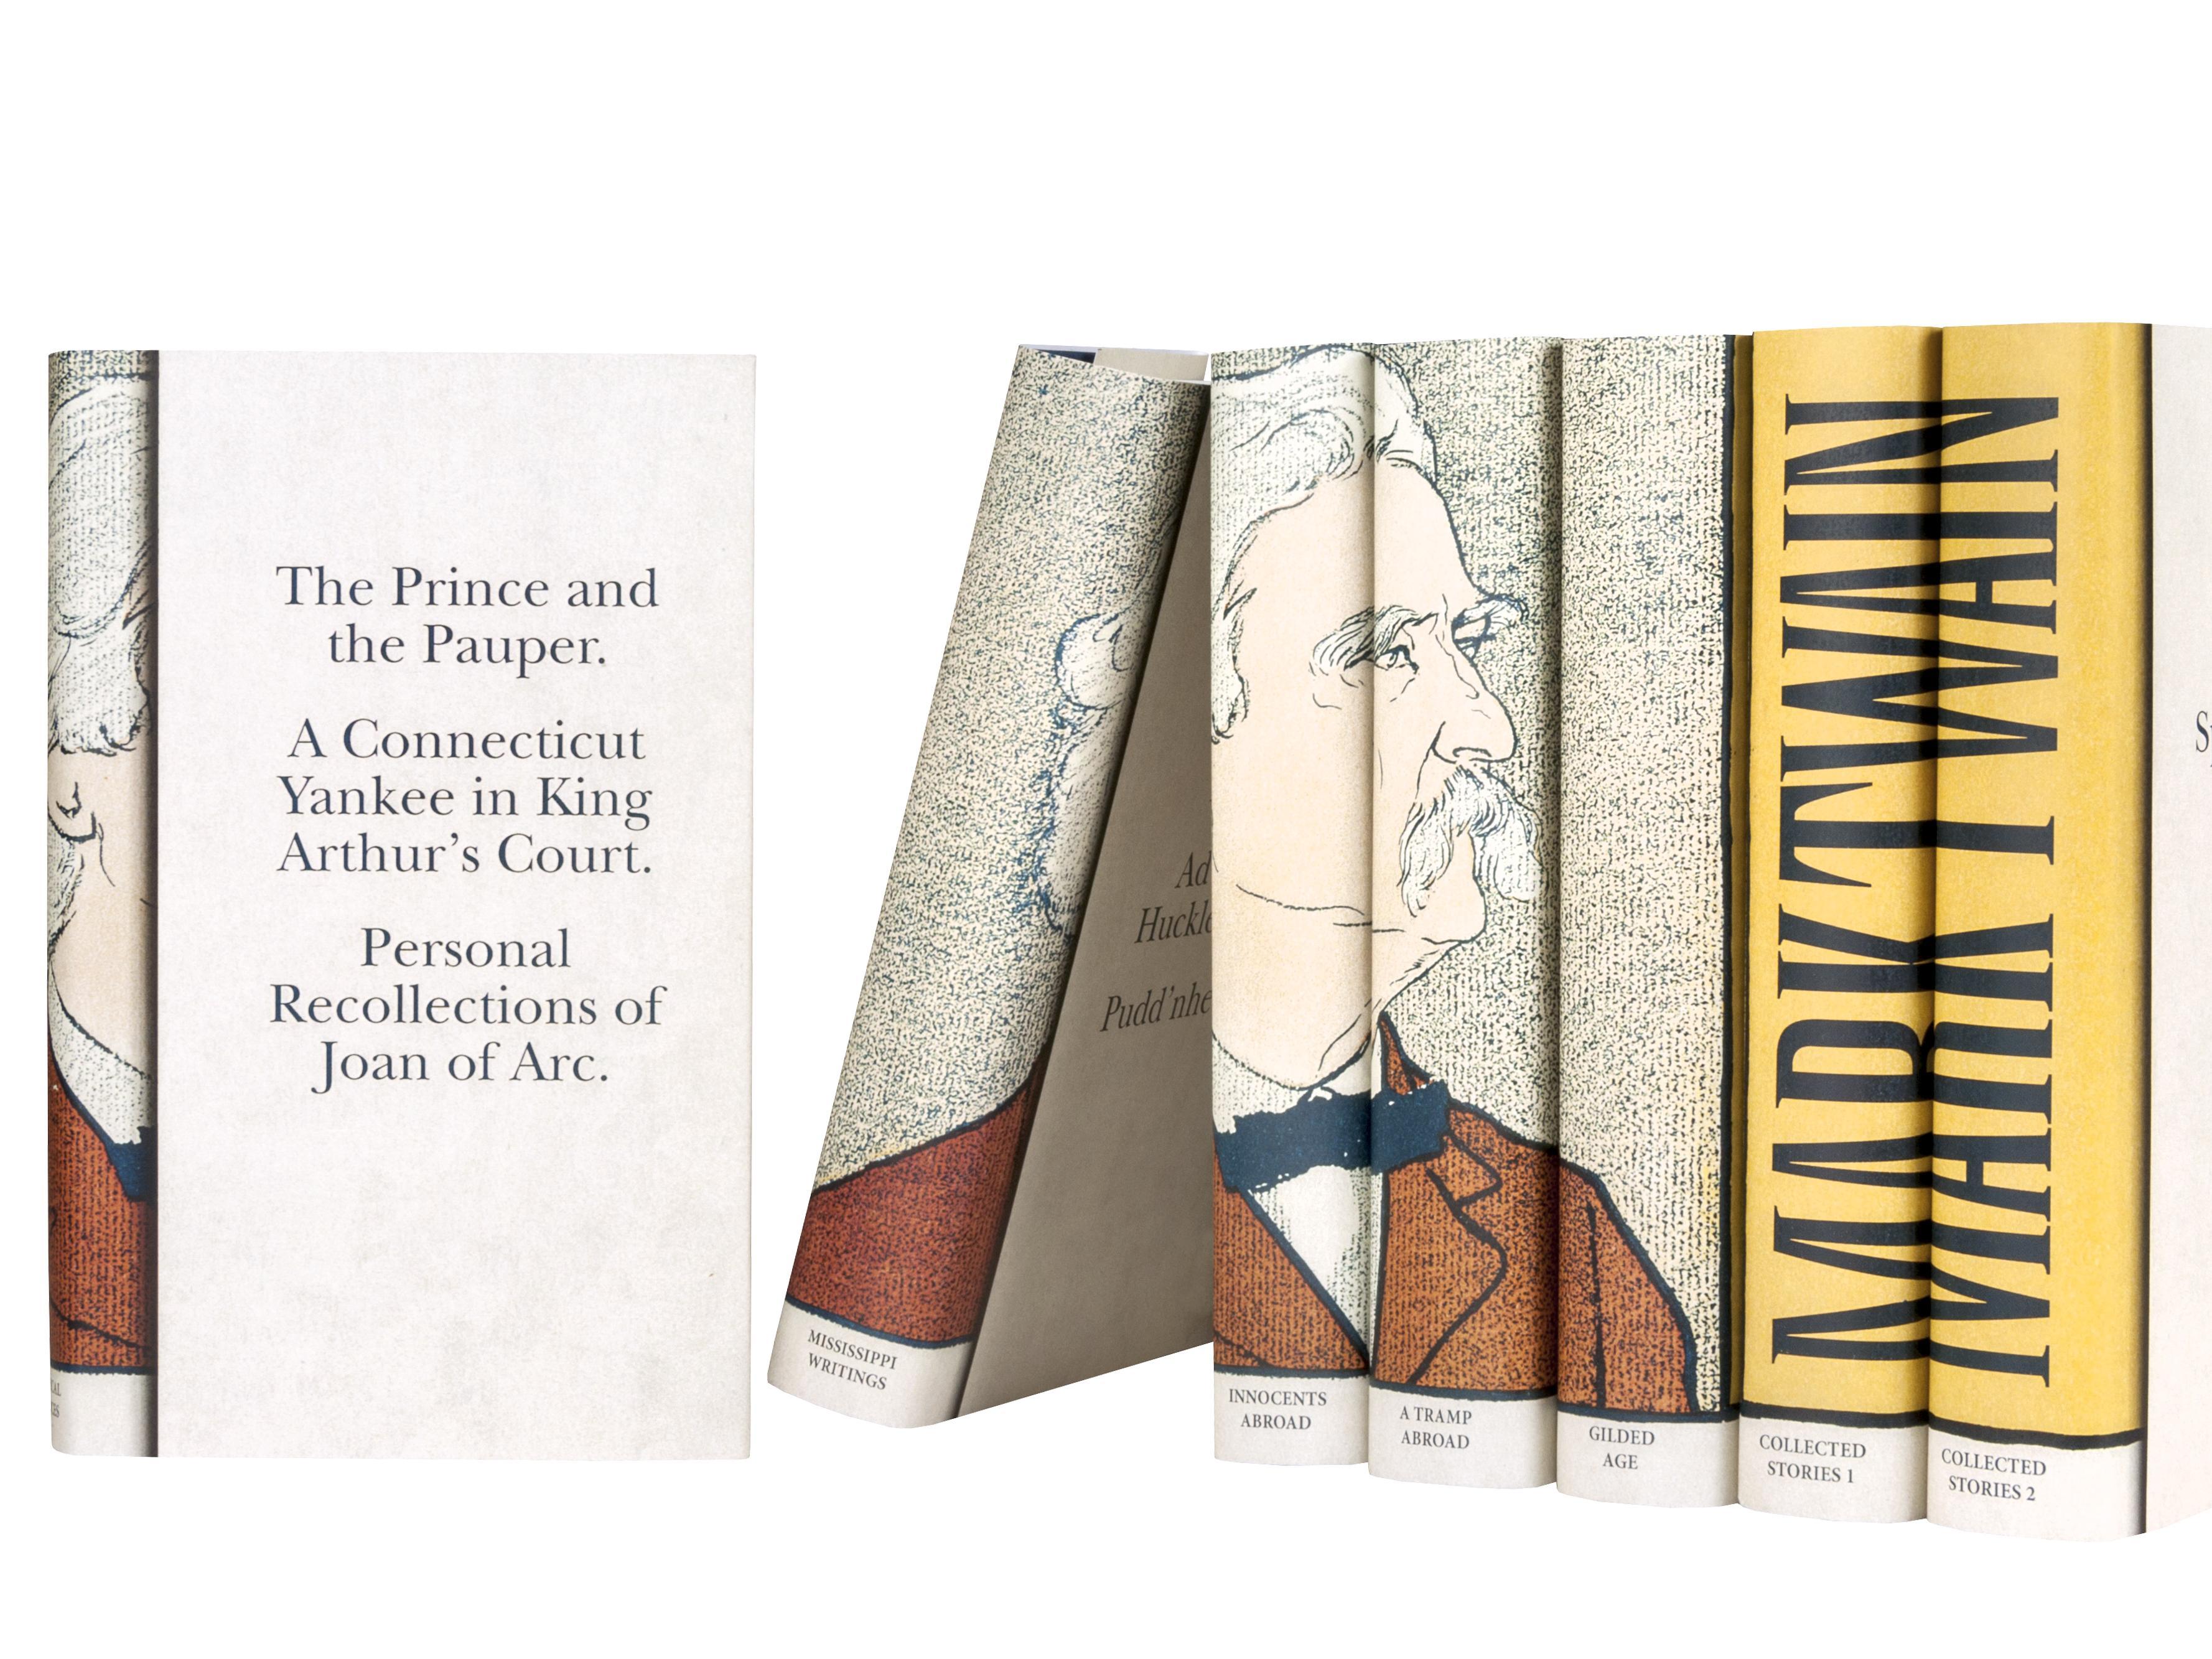 Books By Mark Twain 18 Wide Wallpaper